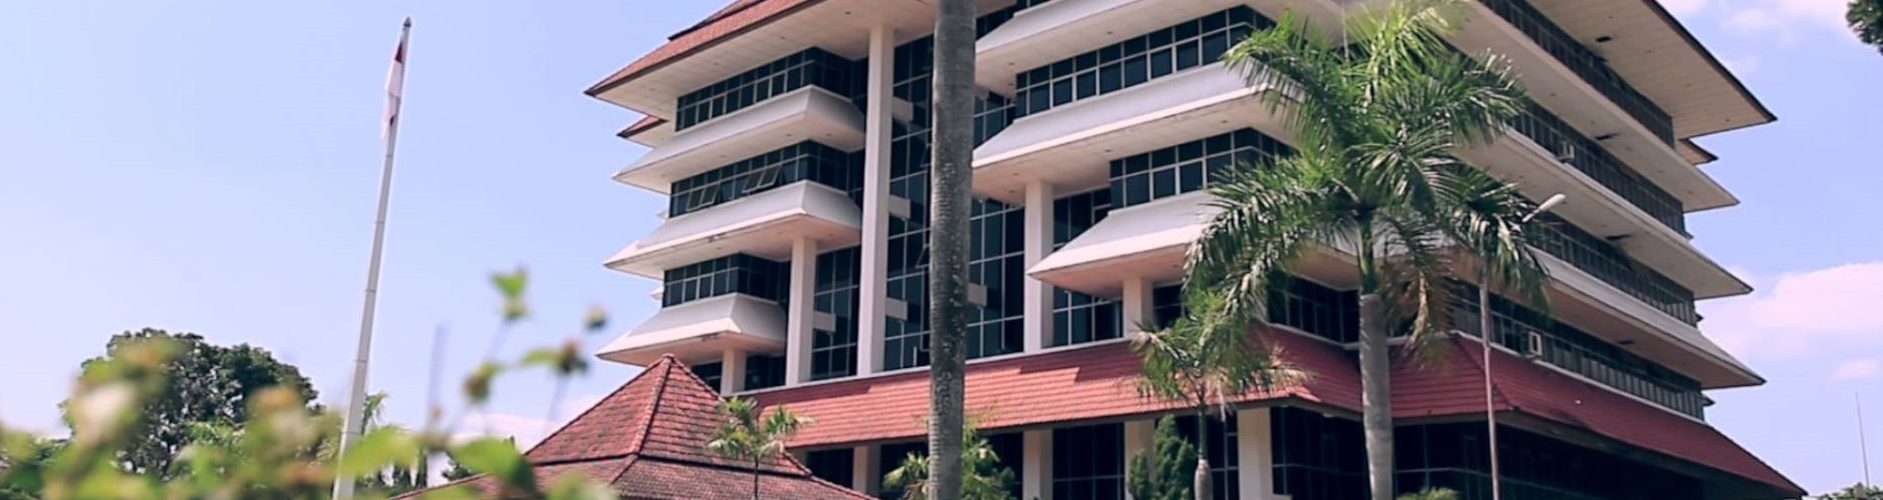 akreditasi program studi UPN Veteran Yogyakarta